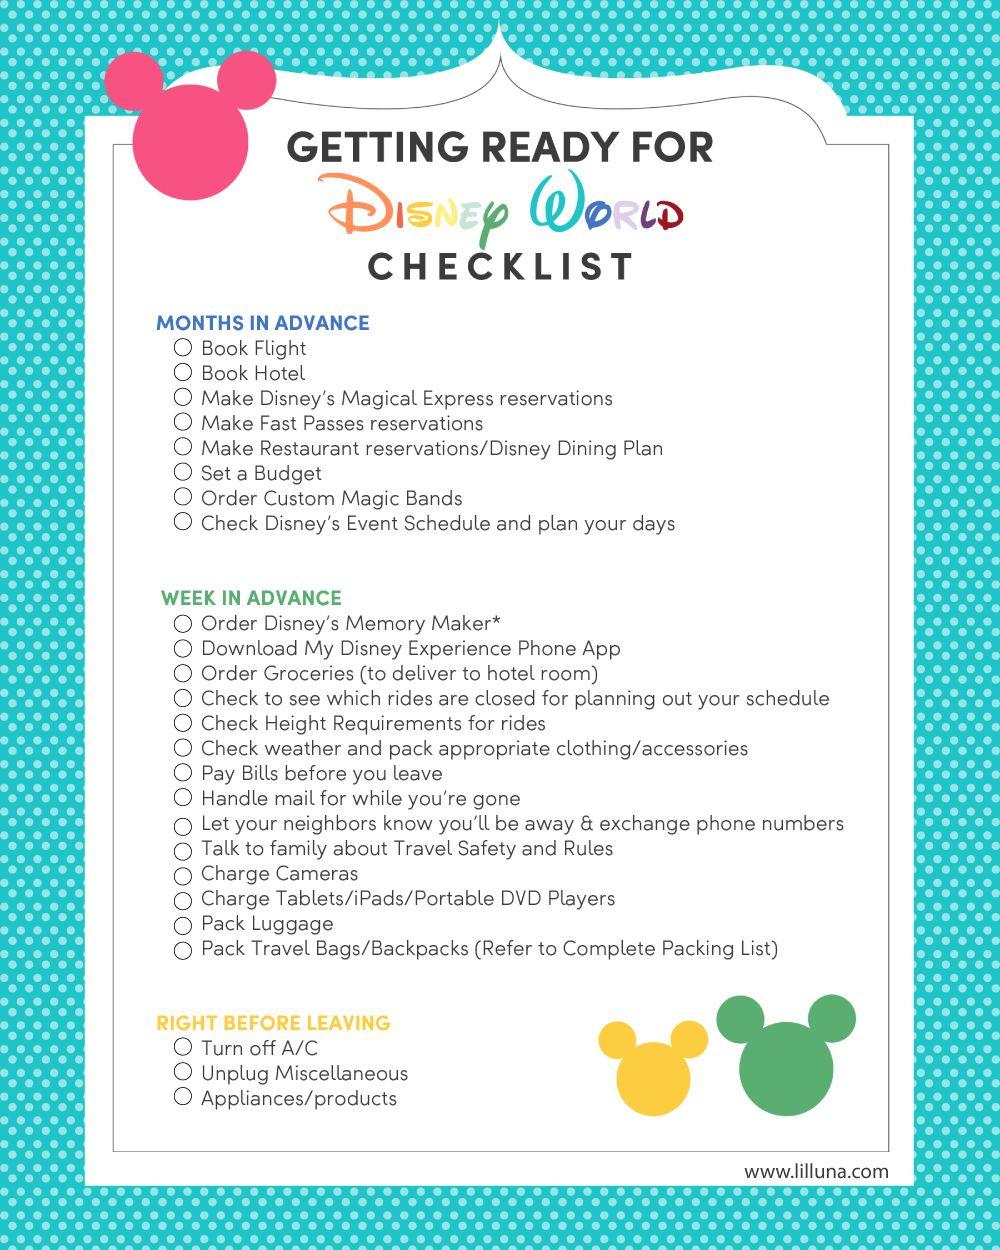 Disney World Packing List | 2020 Disney World | Disney World within Printable List Of Rides At Disney World 2020 Checklist